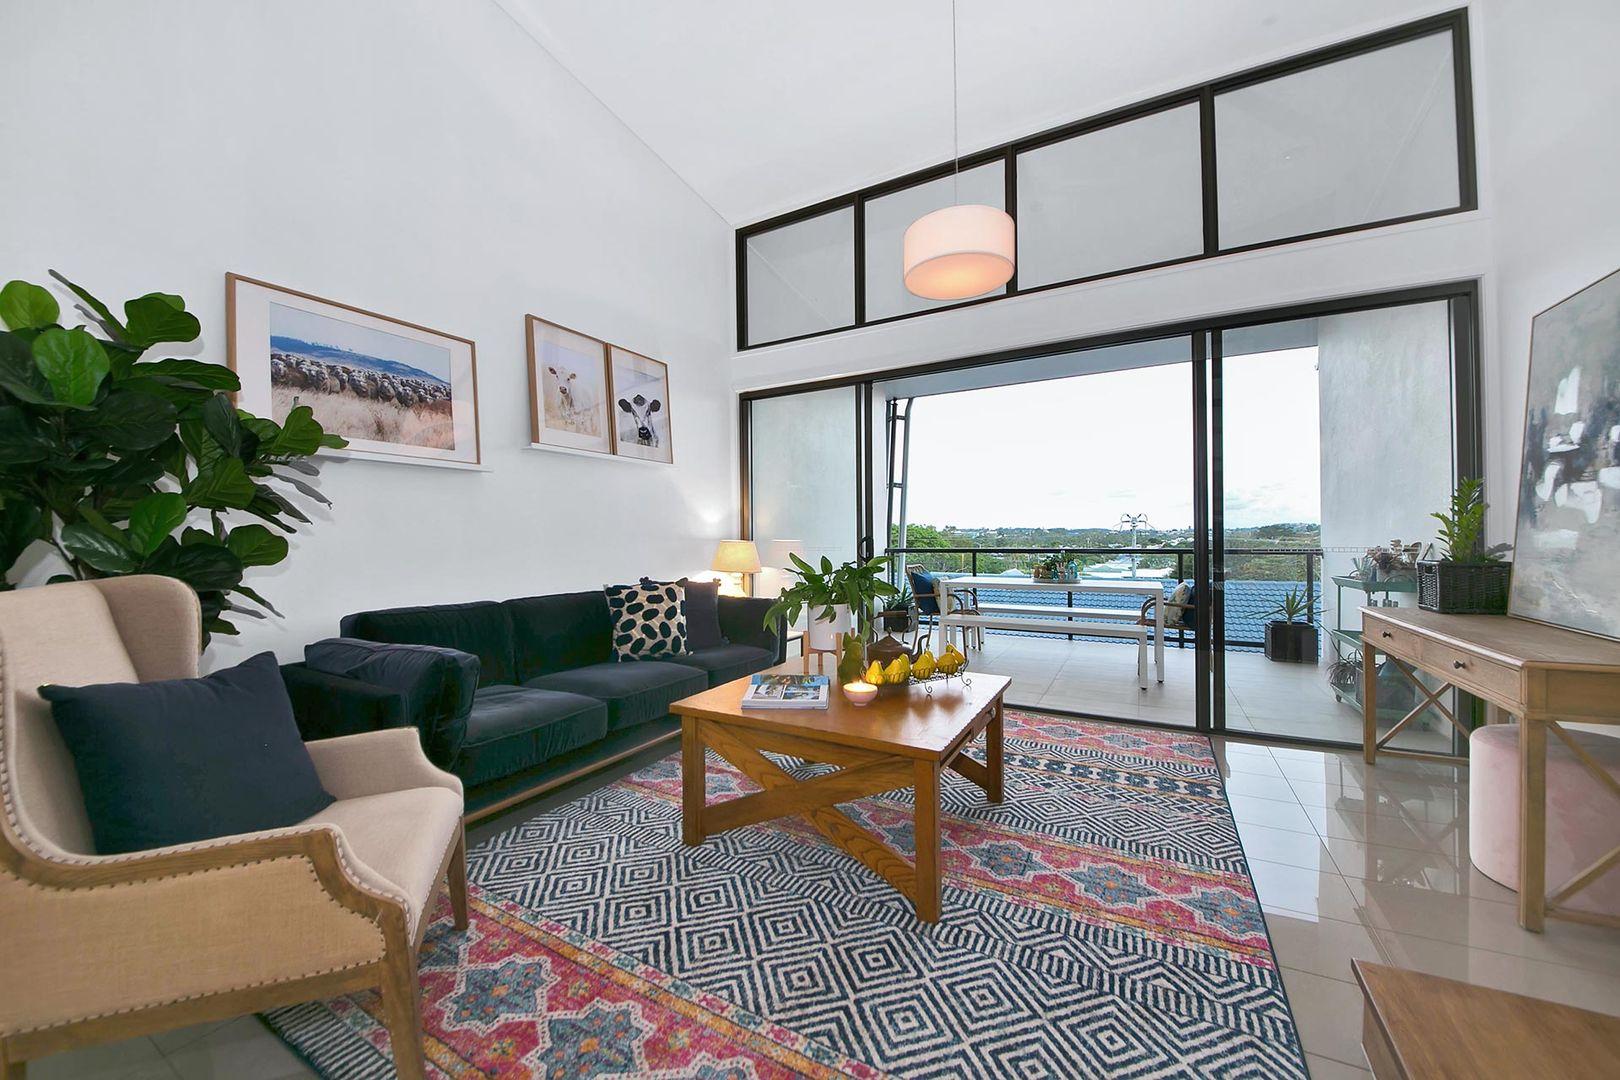 4/39 Waterton Street, Annerley QLD 4103, Image 1